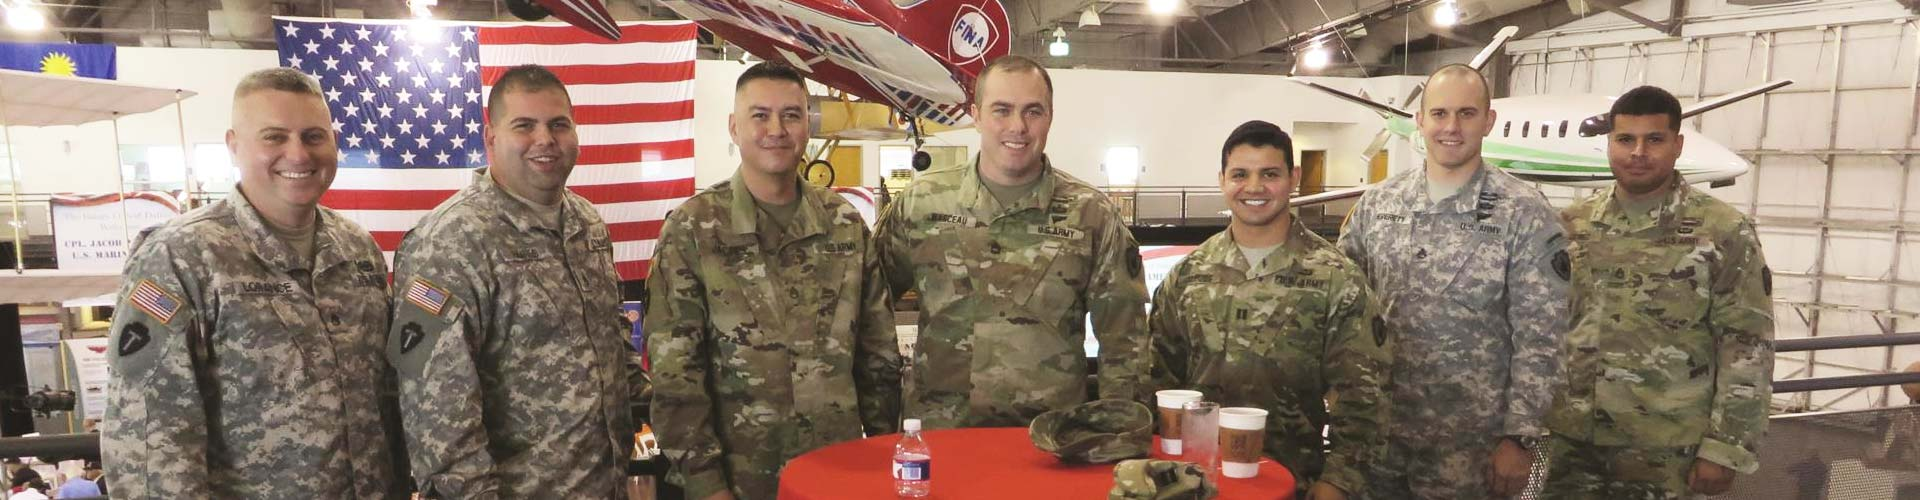 Saluting America's Veterans